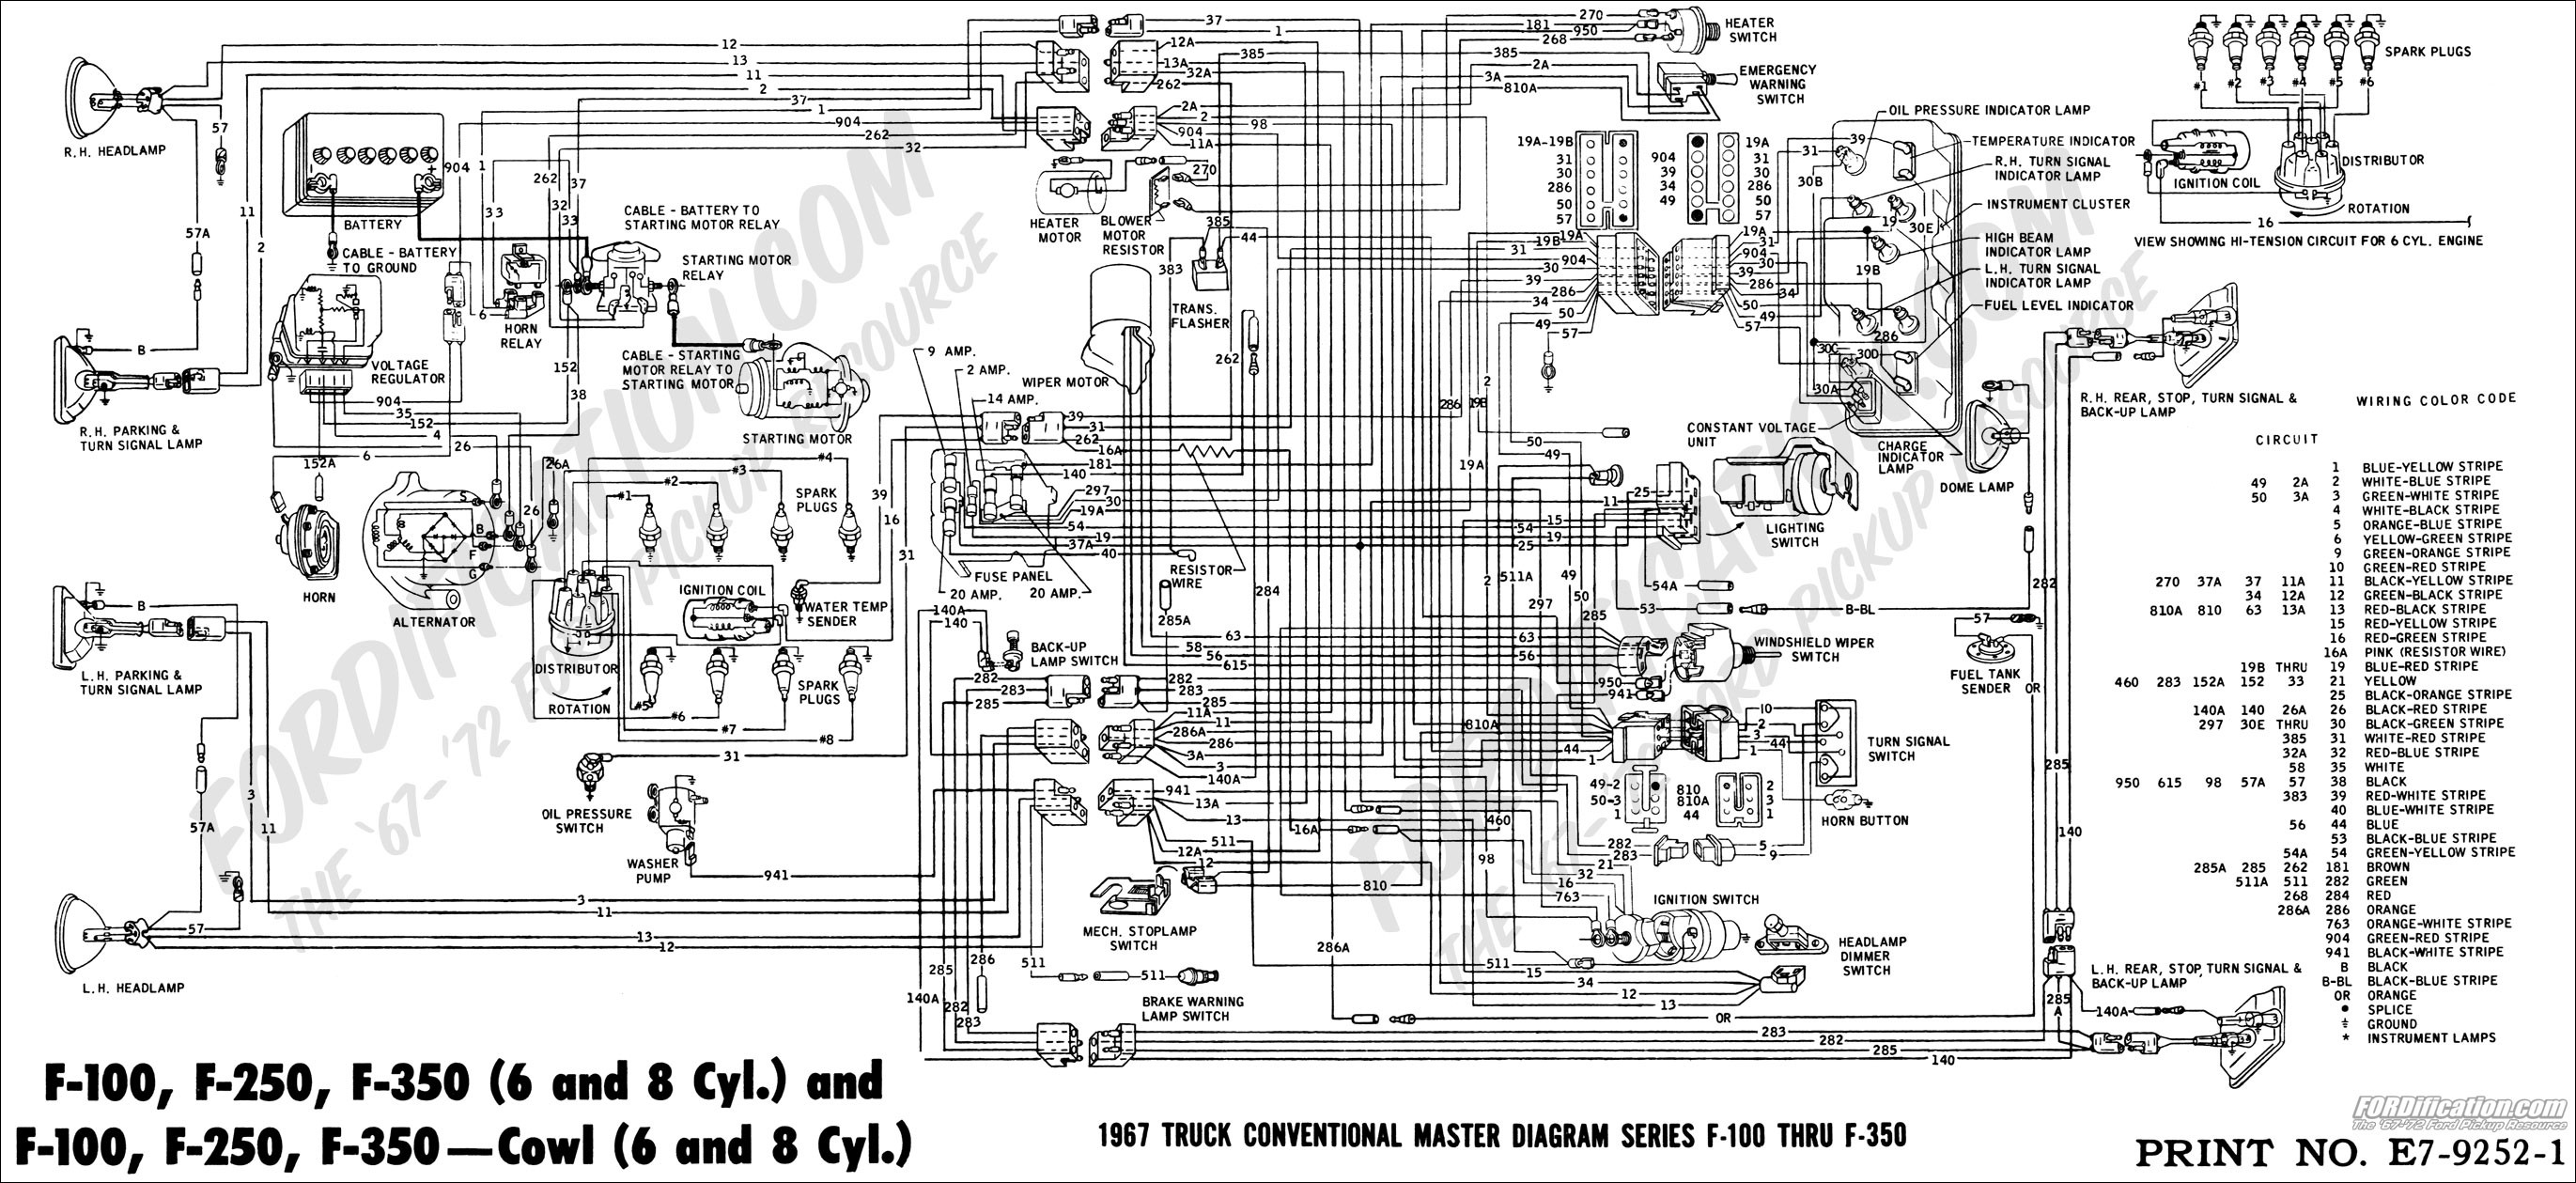 2004 ford Ranger Wiring Diagram 2007 ford Ranger Wiring Diagram Canopi Of 2004  ford Ranger Wiring